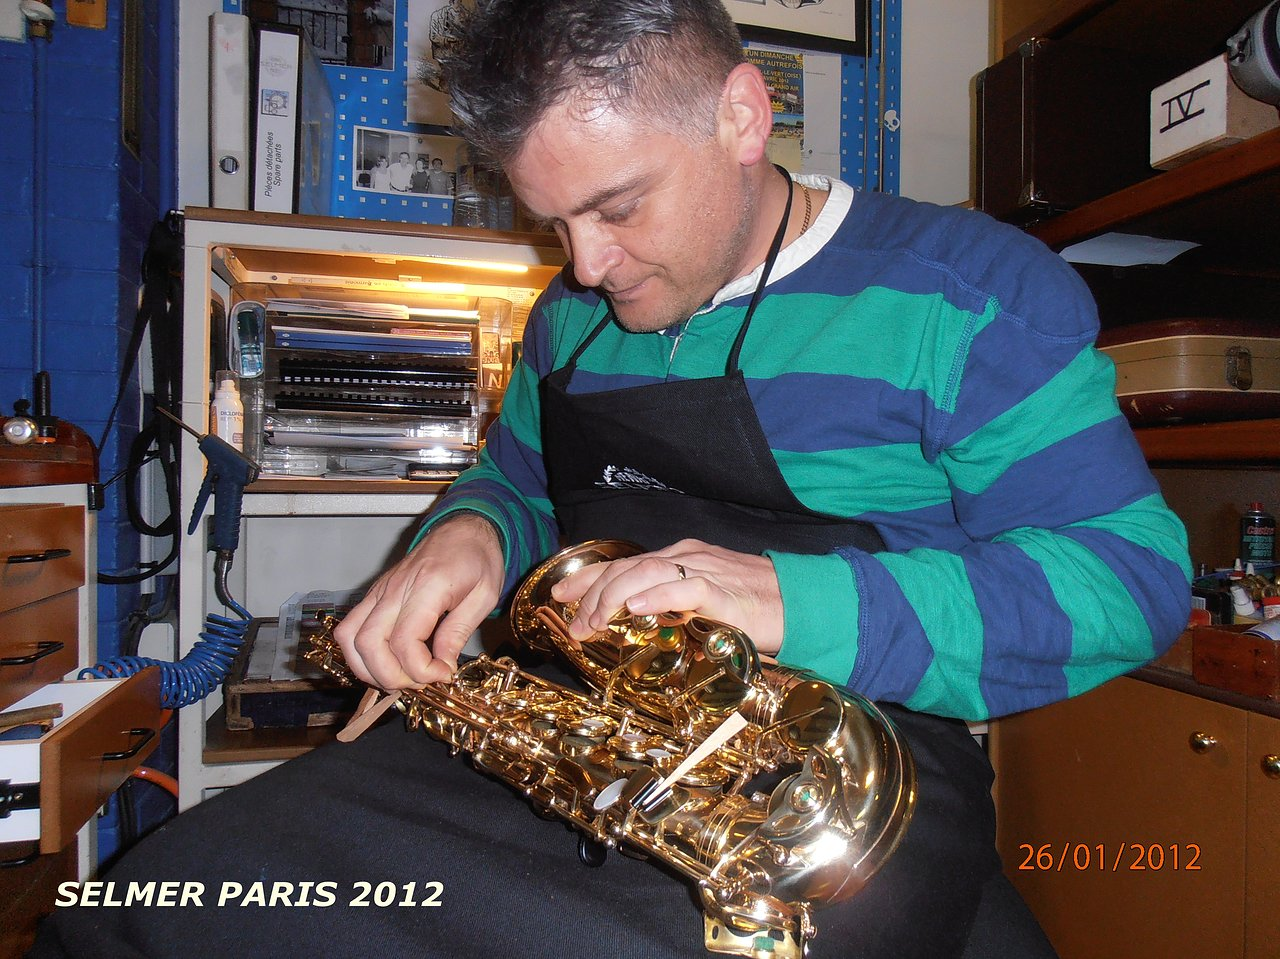 PARIZ SELMER 2012